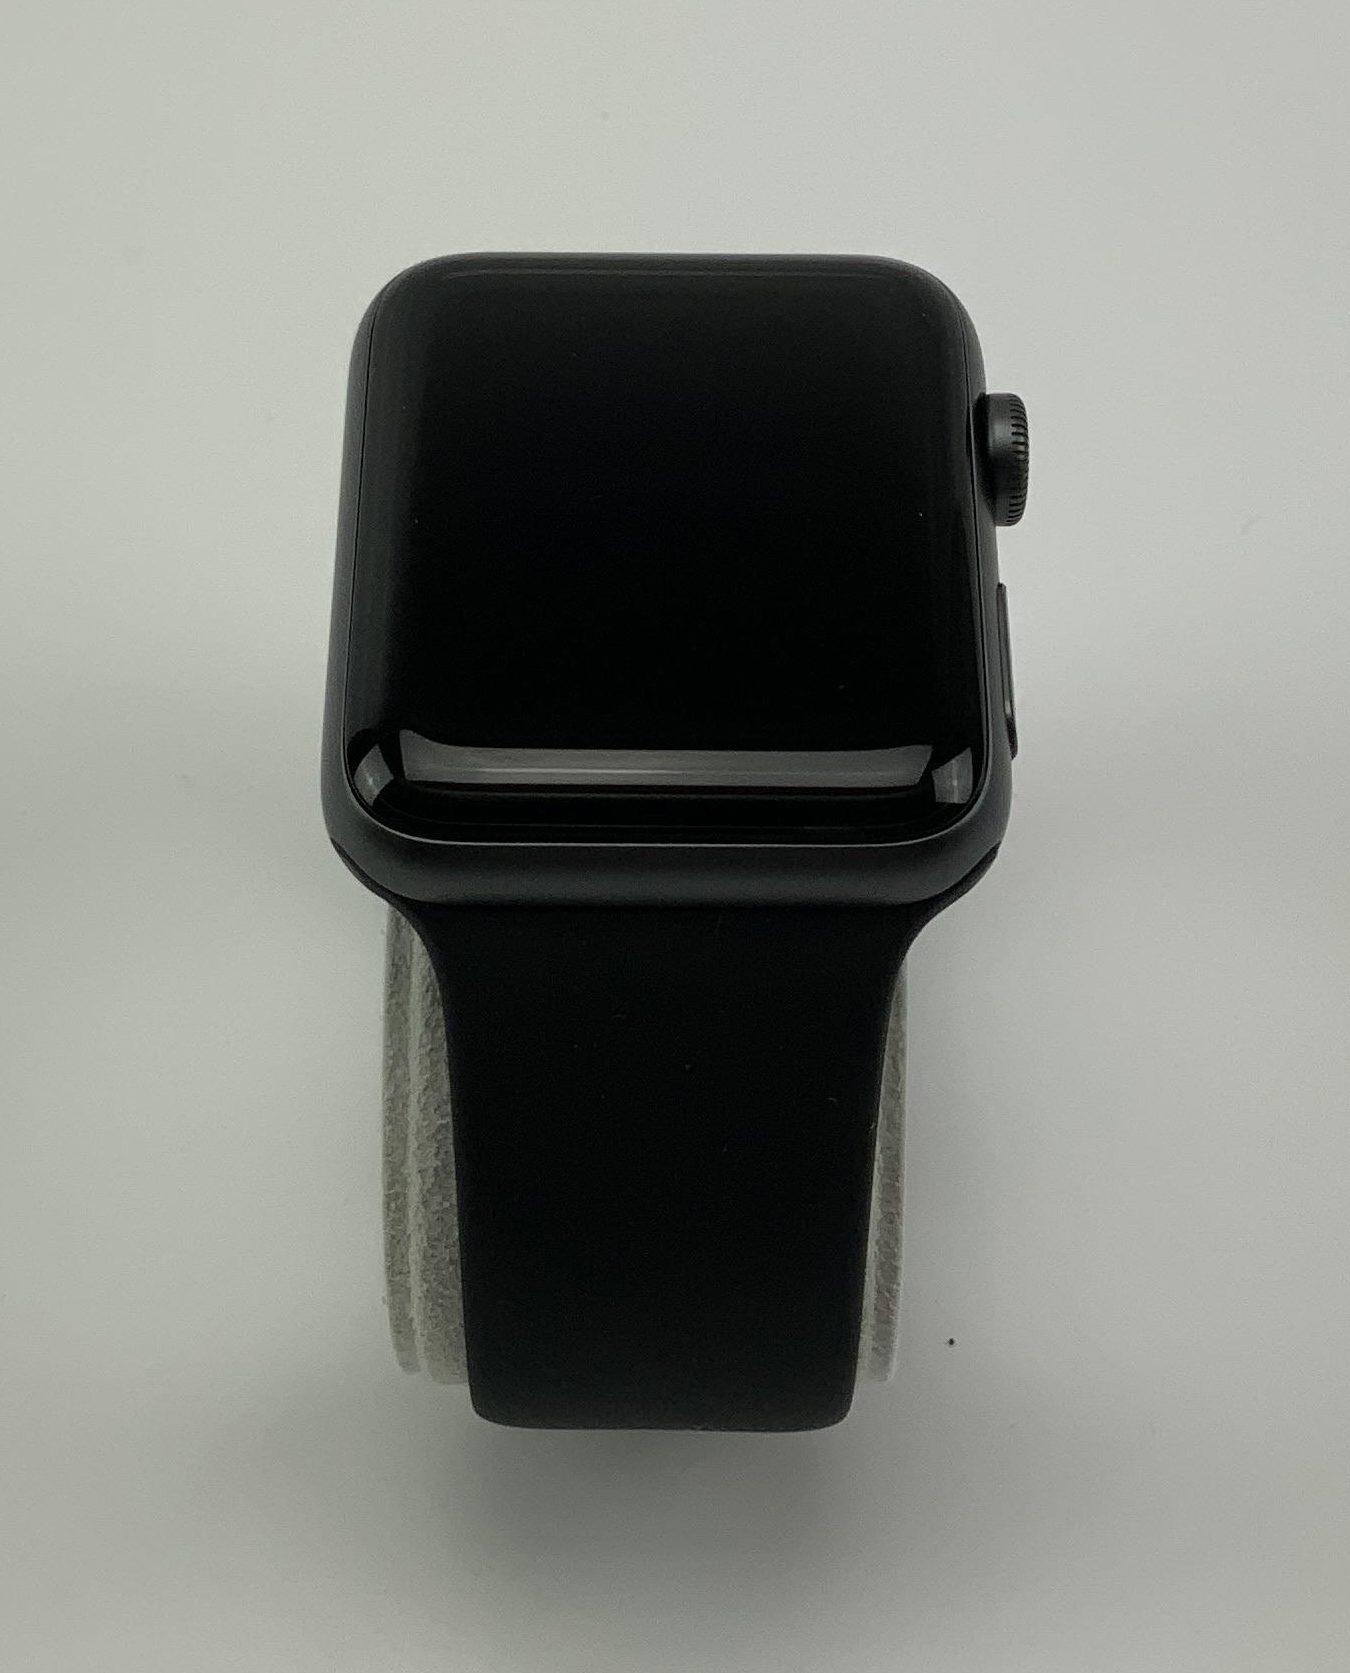 Watch Series 3 Aluminum (42mm), Space Gray, Black Sport Band, imagen 2